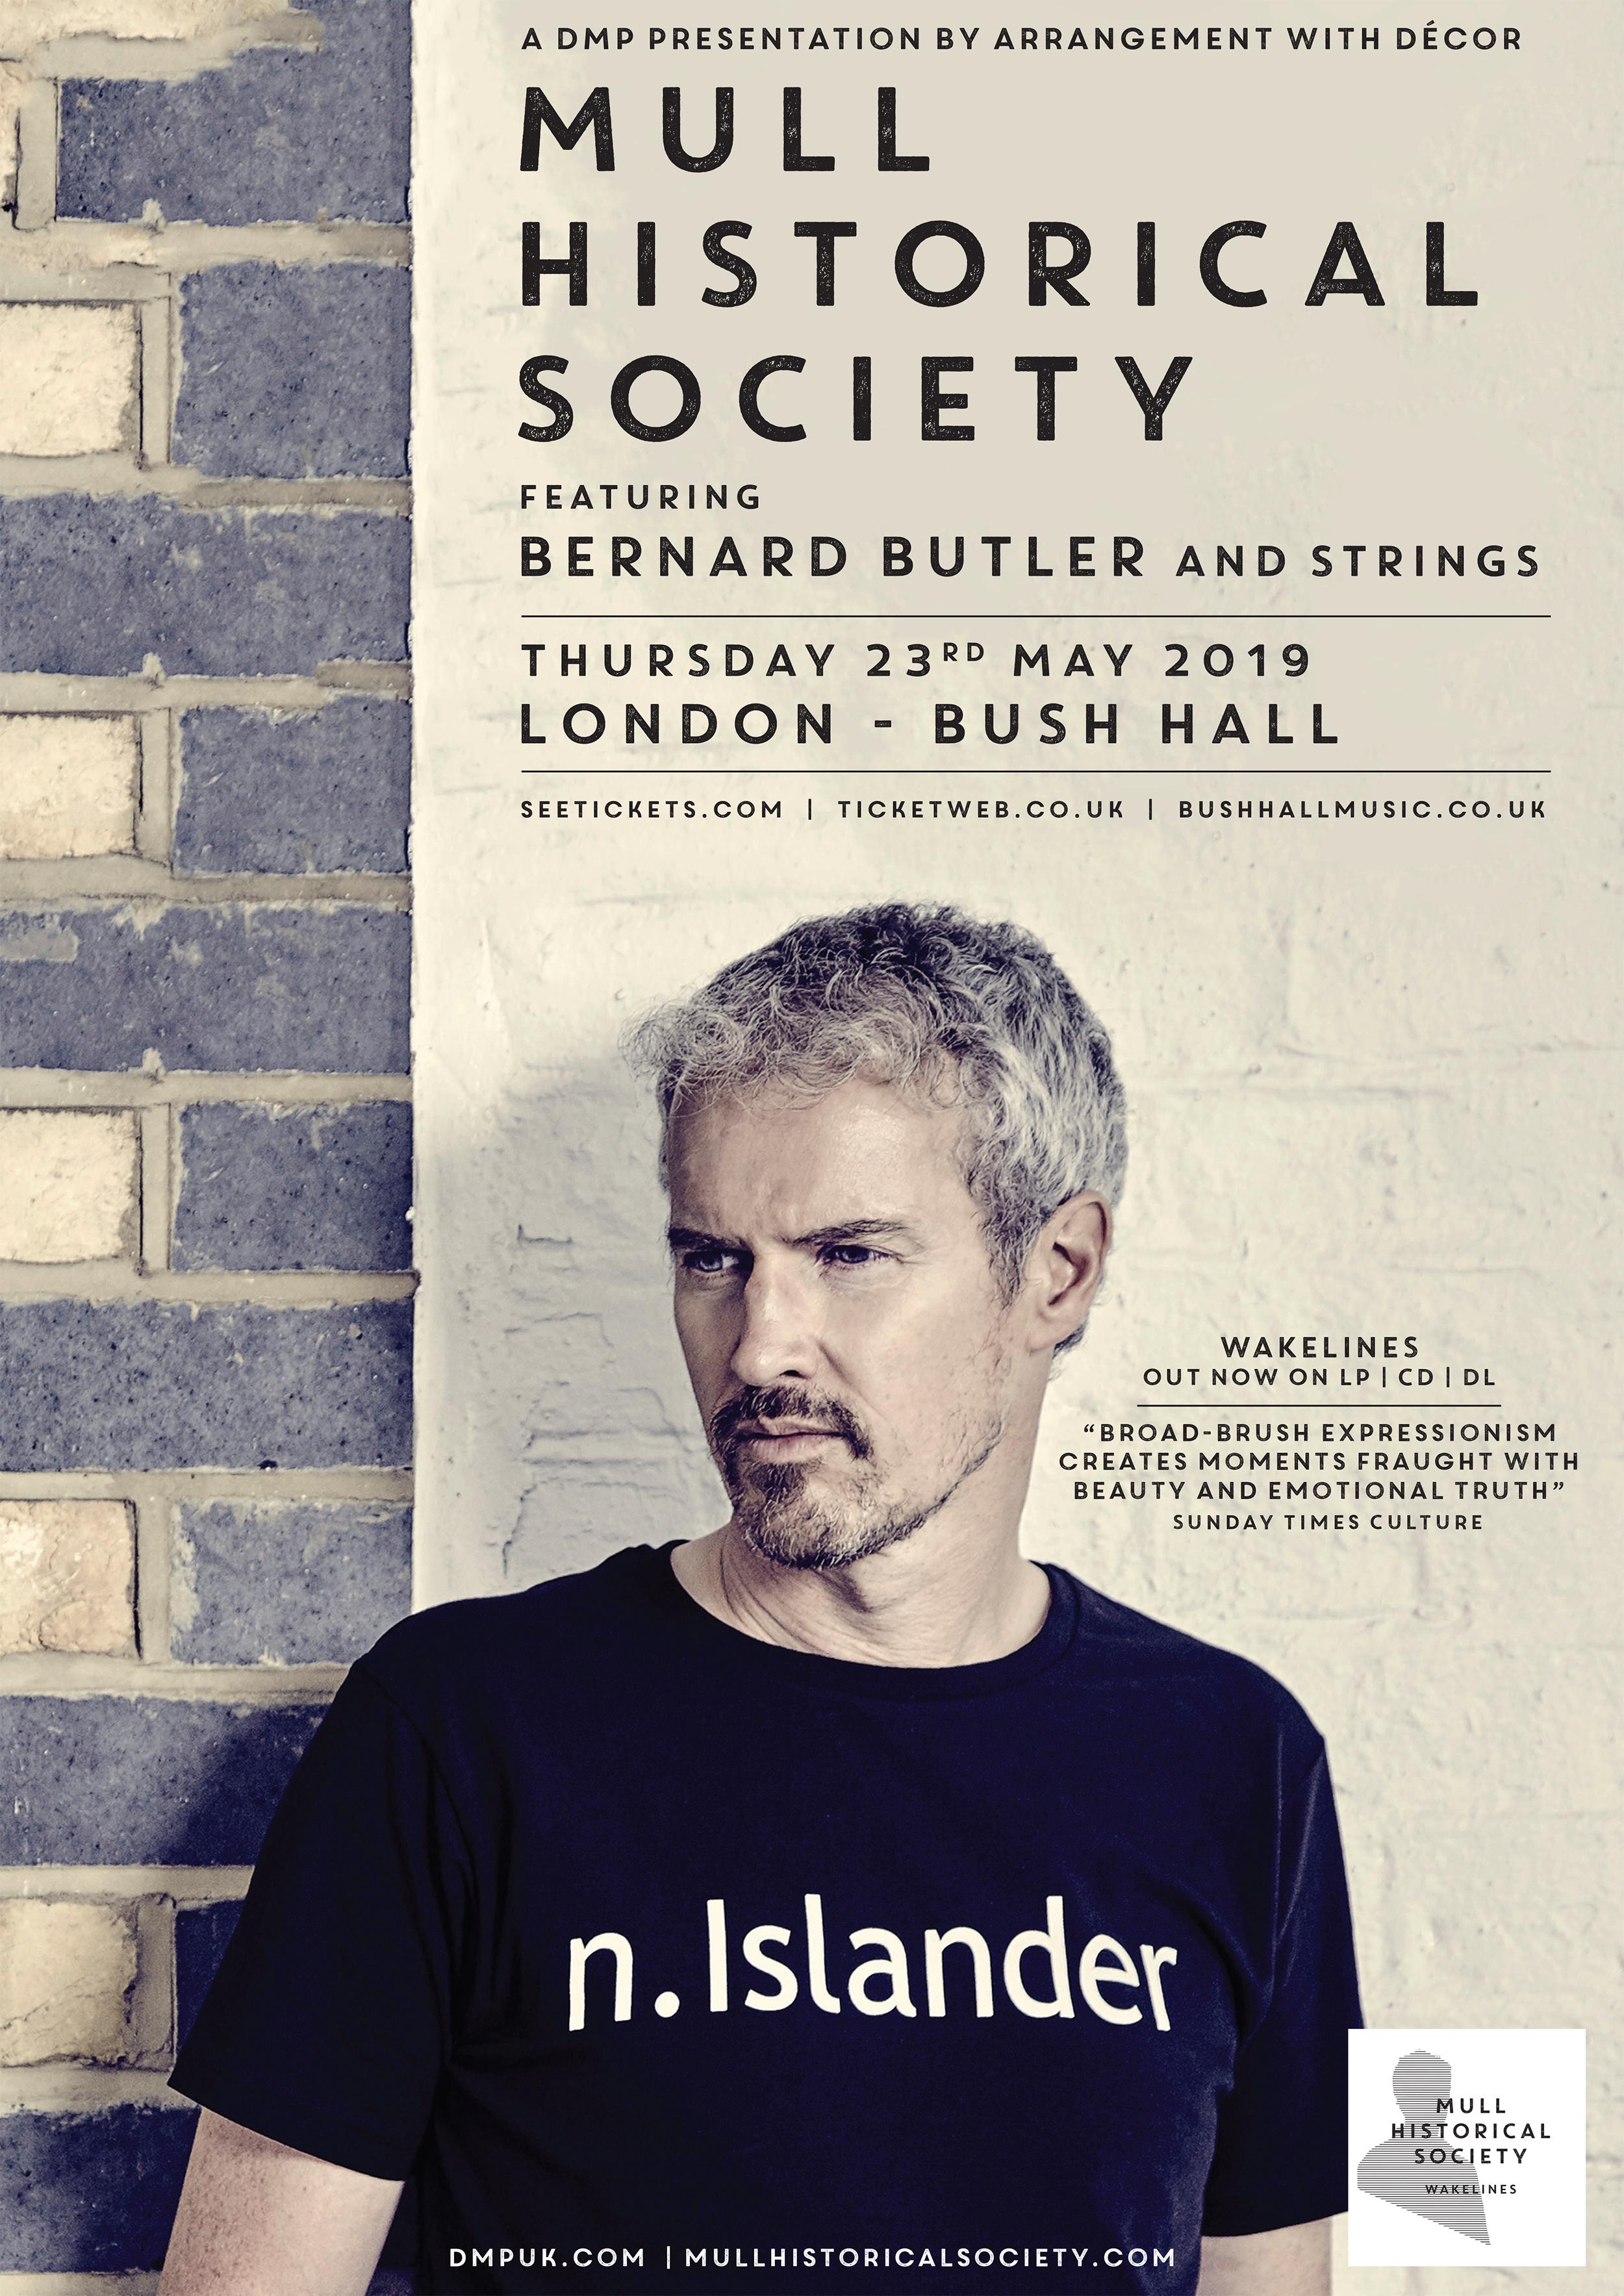 Mull Historical Society feat. Bernard Butler Bush Hall London May 23rd